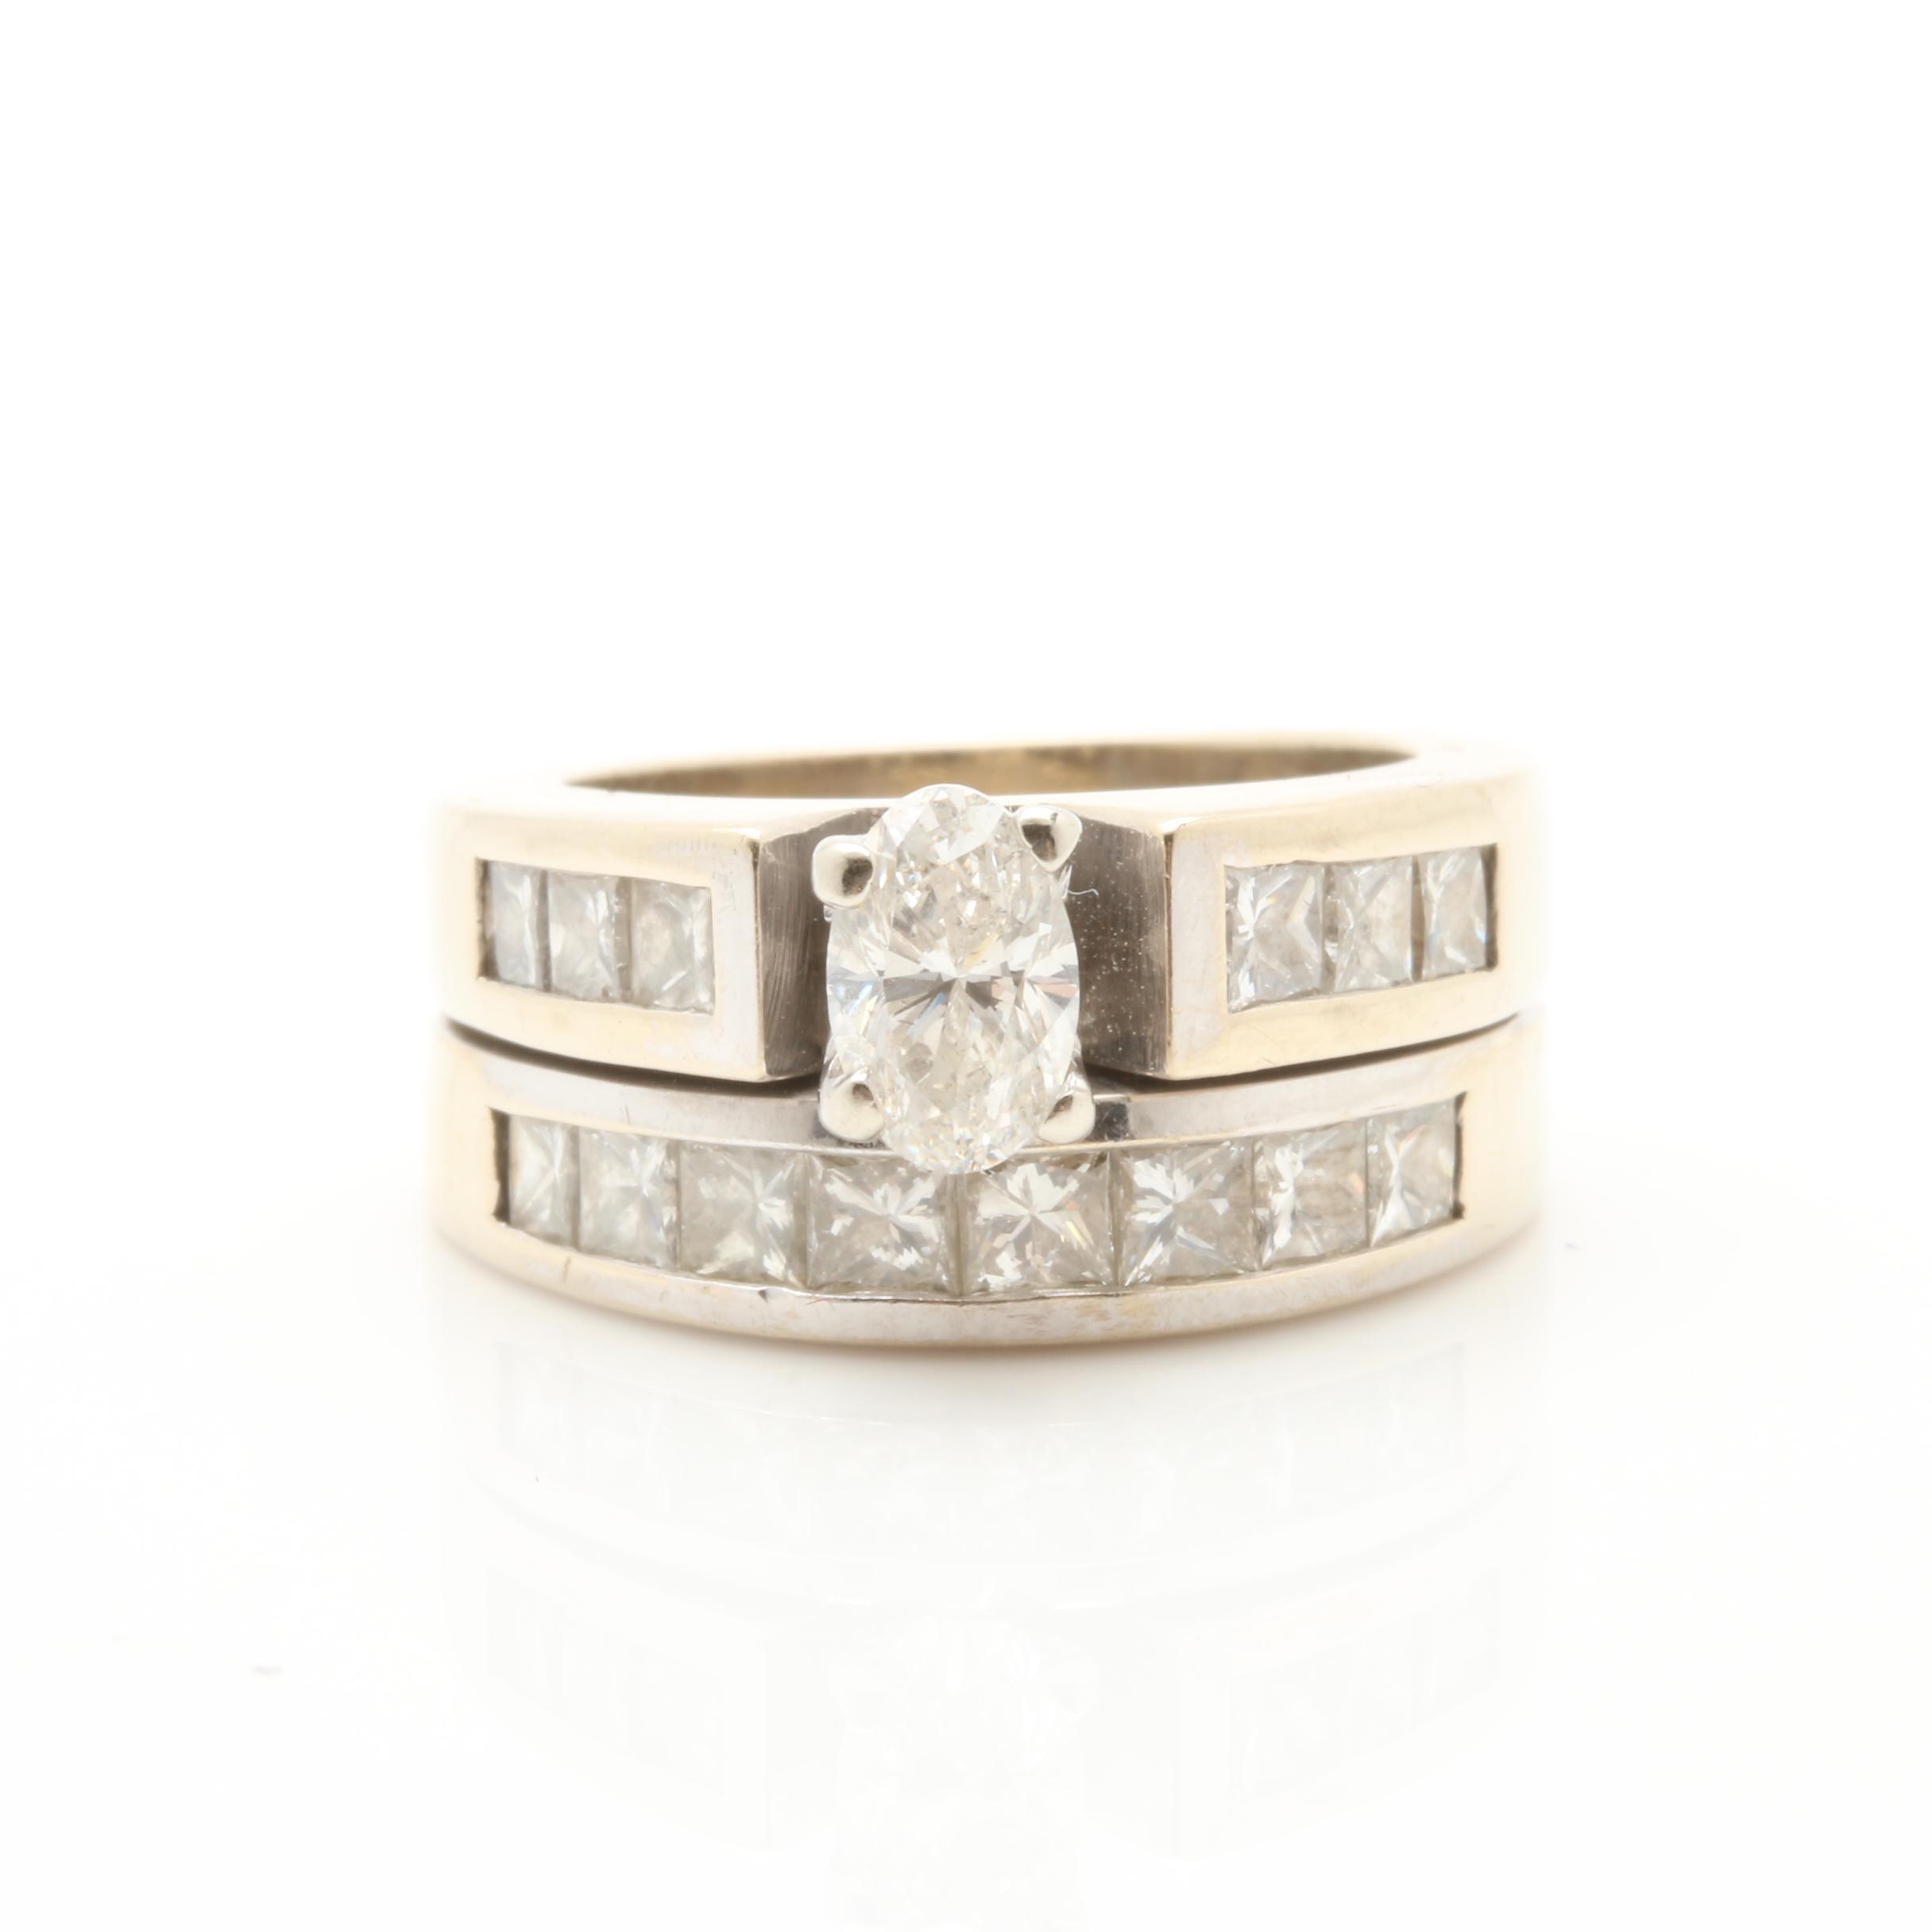 18K White Gold 2.02 CTW Diamond Ring Set